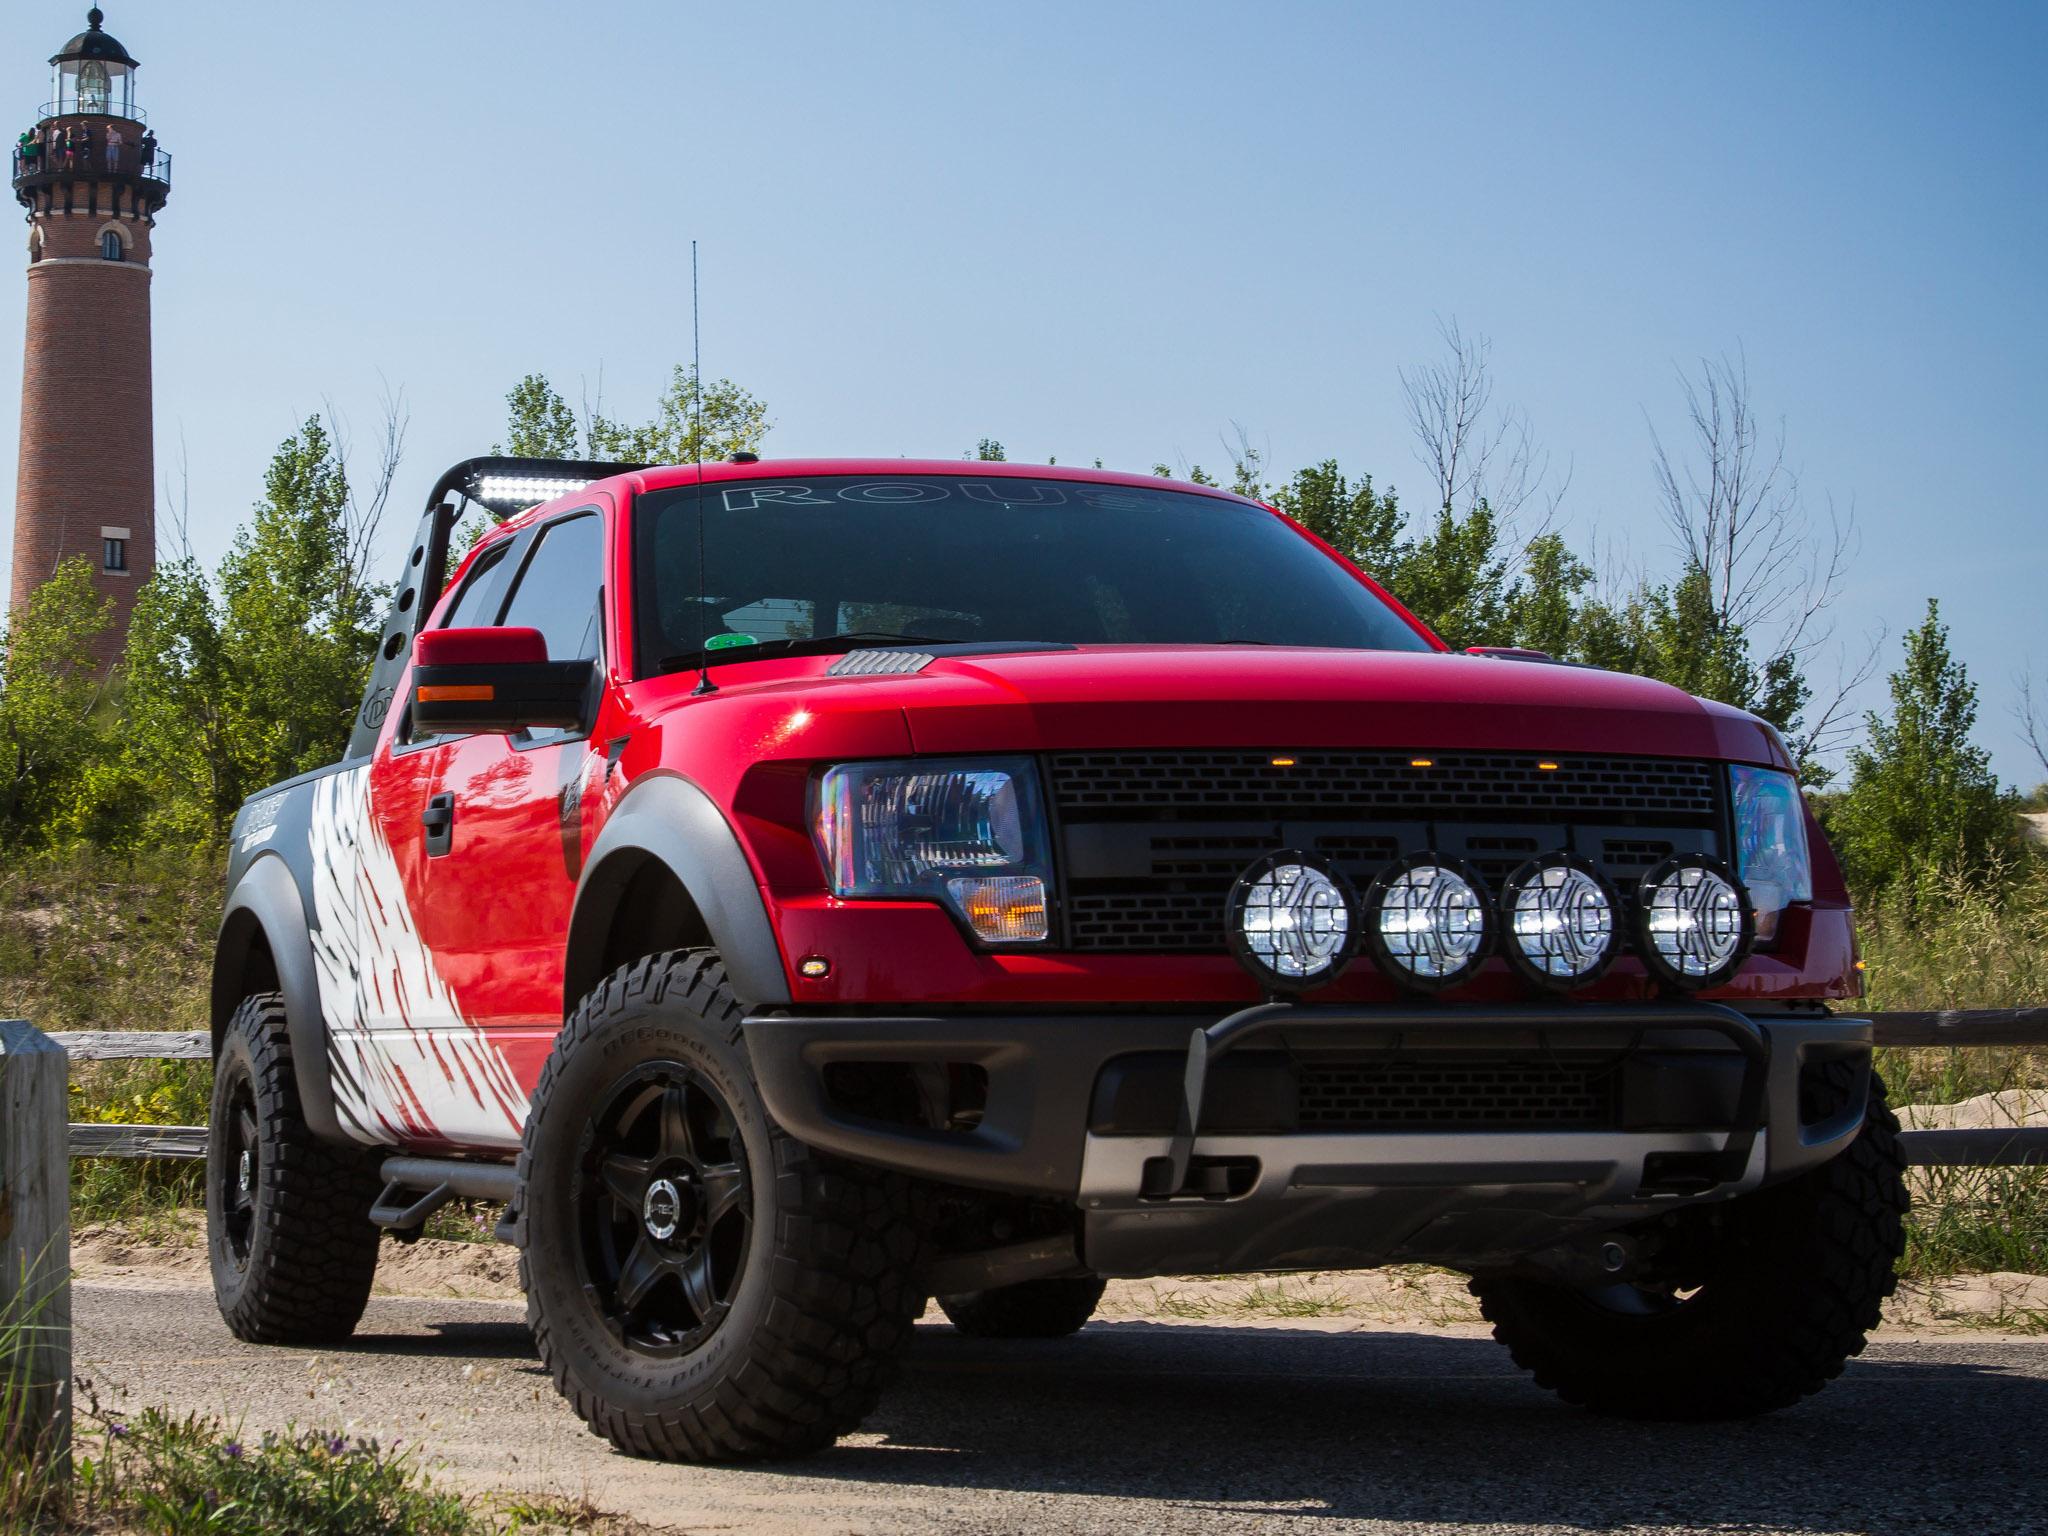 2012 Roush Ford F 150 SVT Raptor 4x4 muscle truck wallpaper background 2048x1536